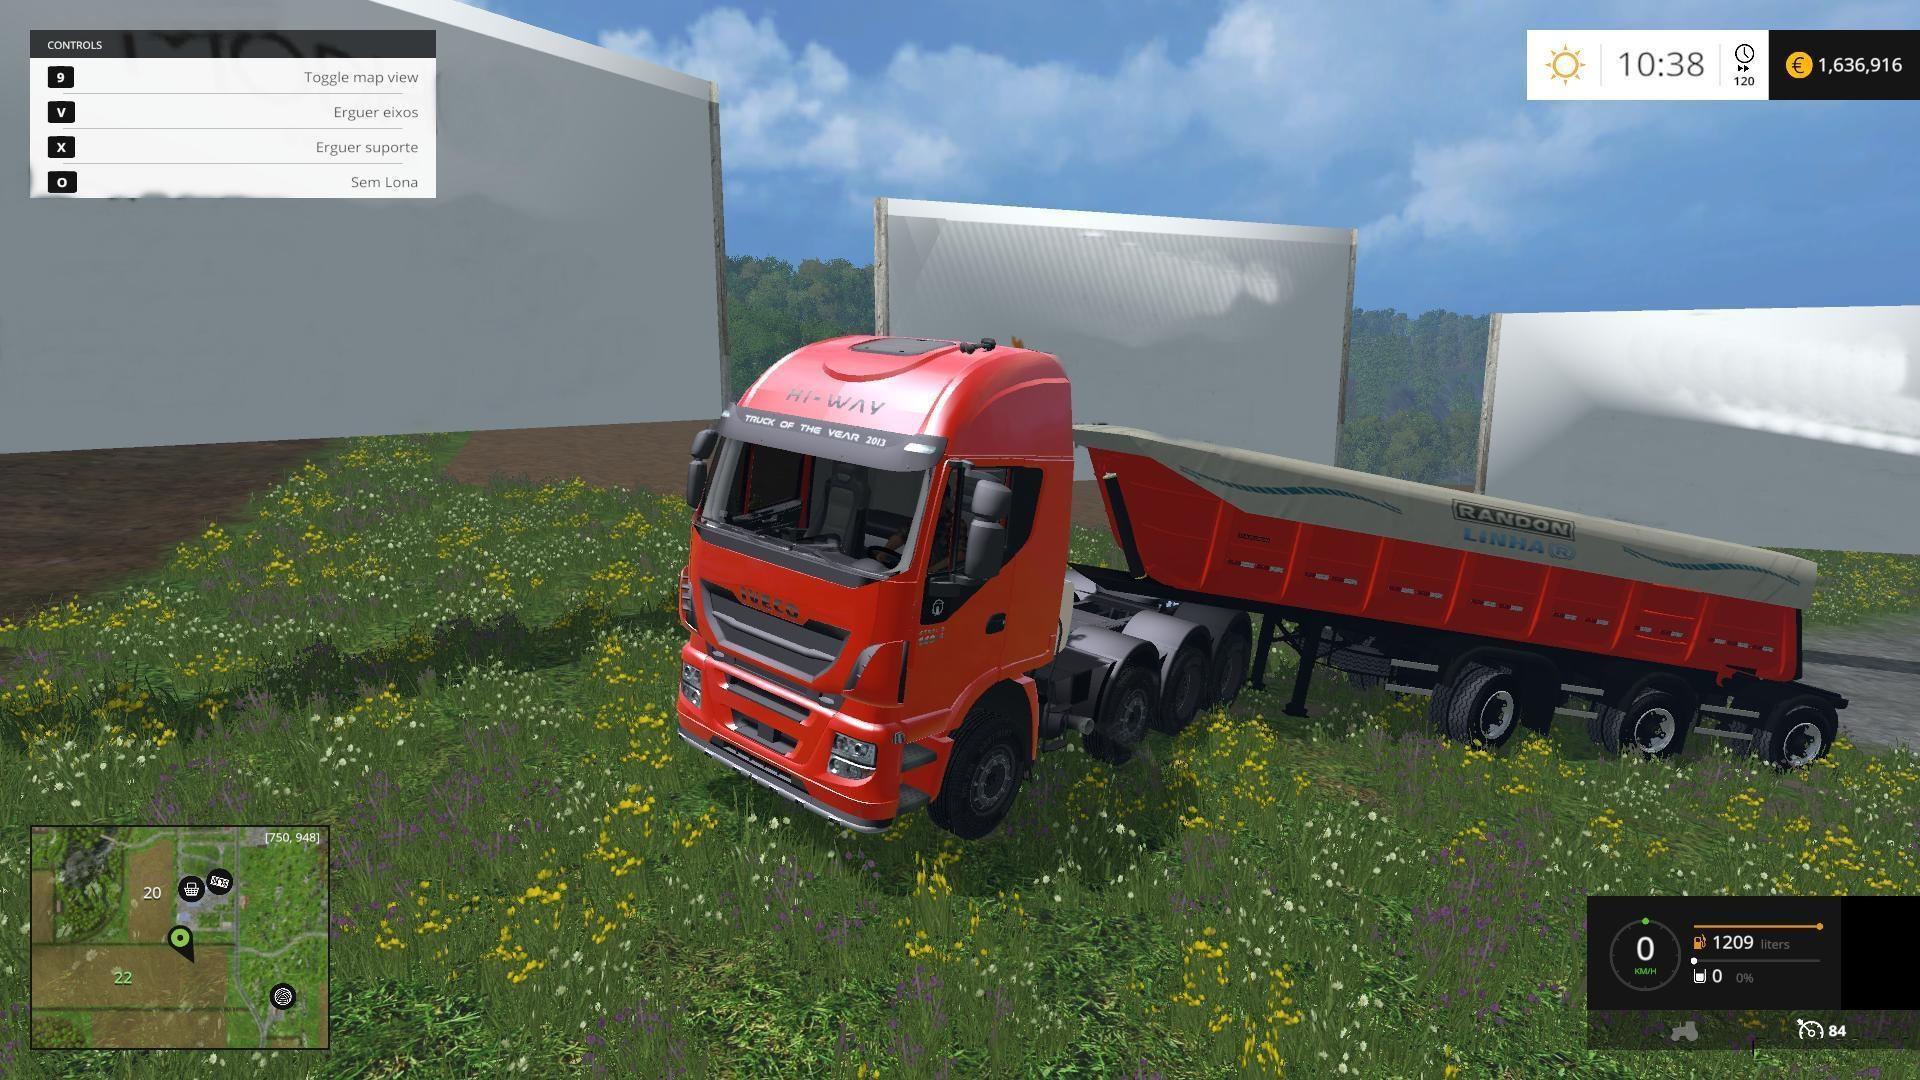 Trucks farming simulator 2013 mods - FS LS 2013 mods